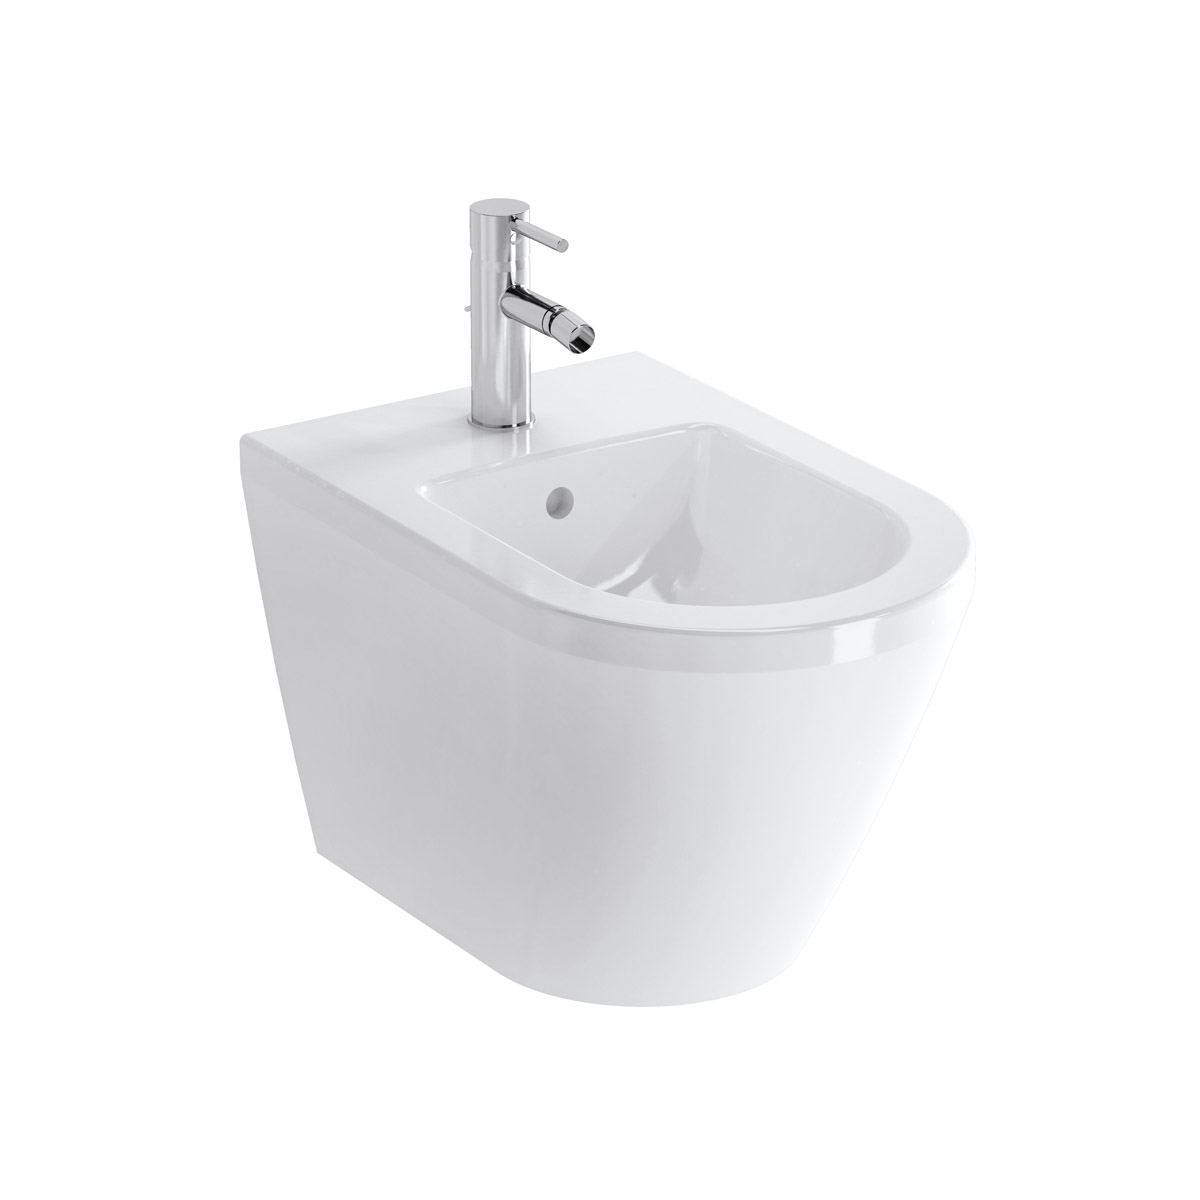 Integra Wand-Bidet, Weiß VitrA Clean